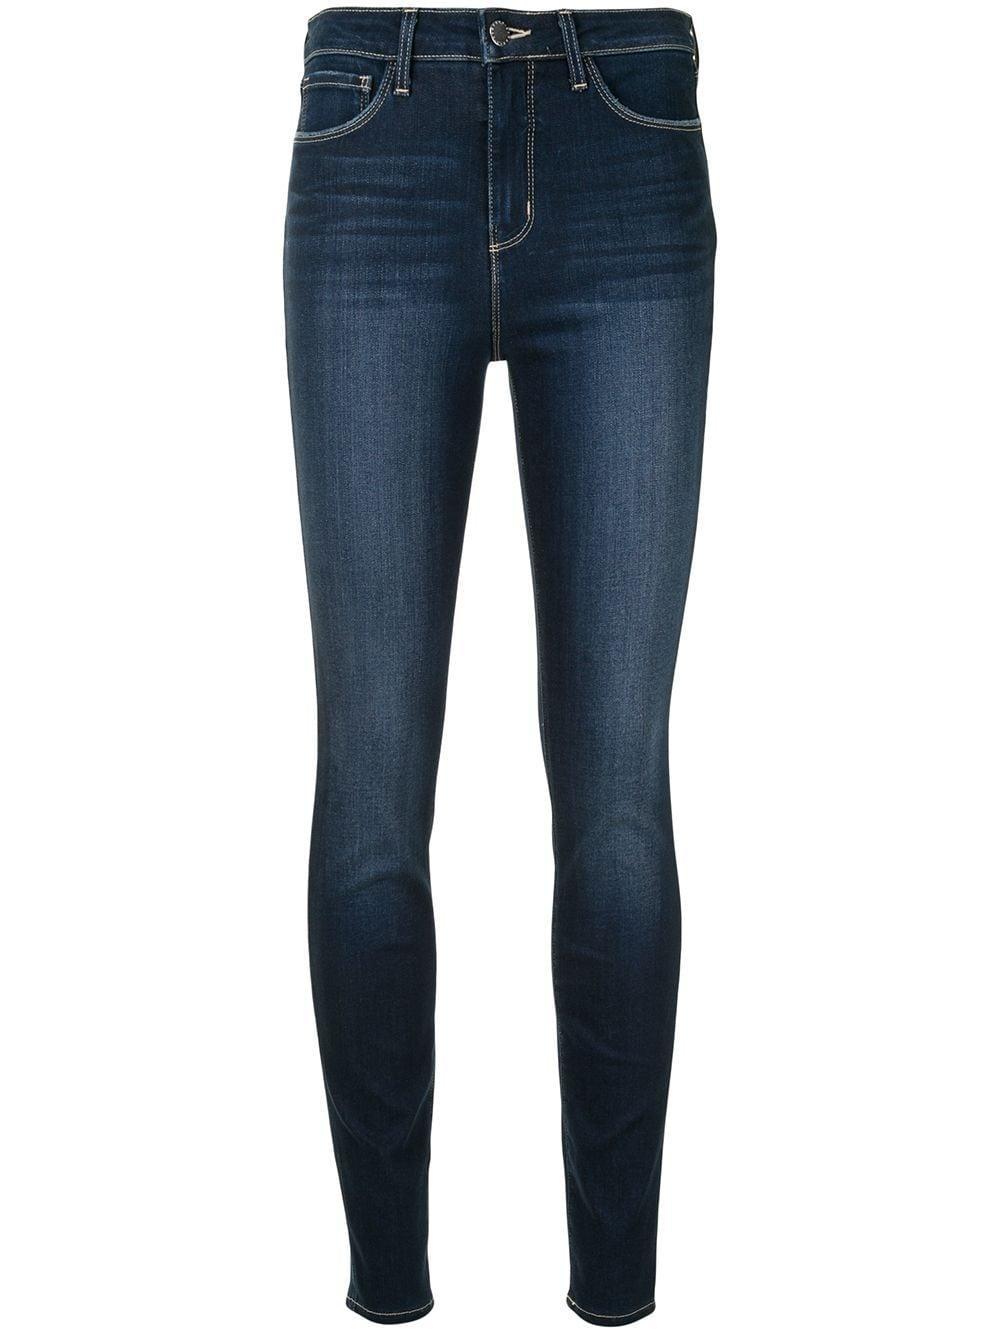 Marguerite Skinny Jeans Item # 2352DXL-B